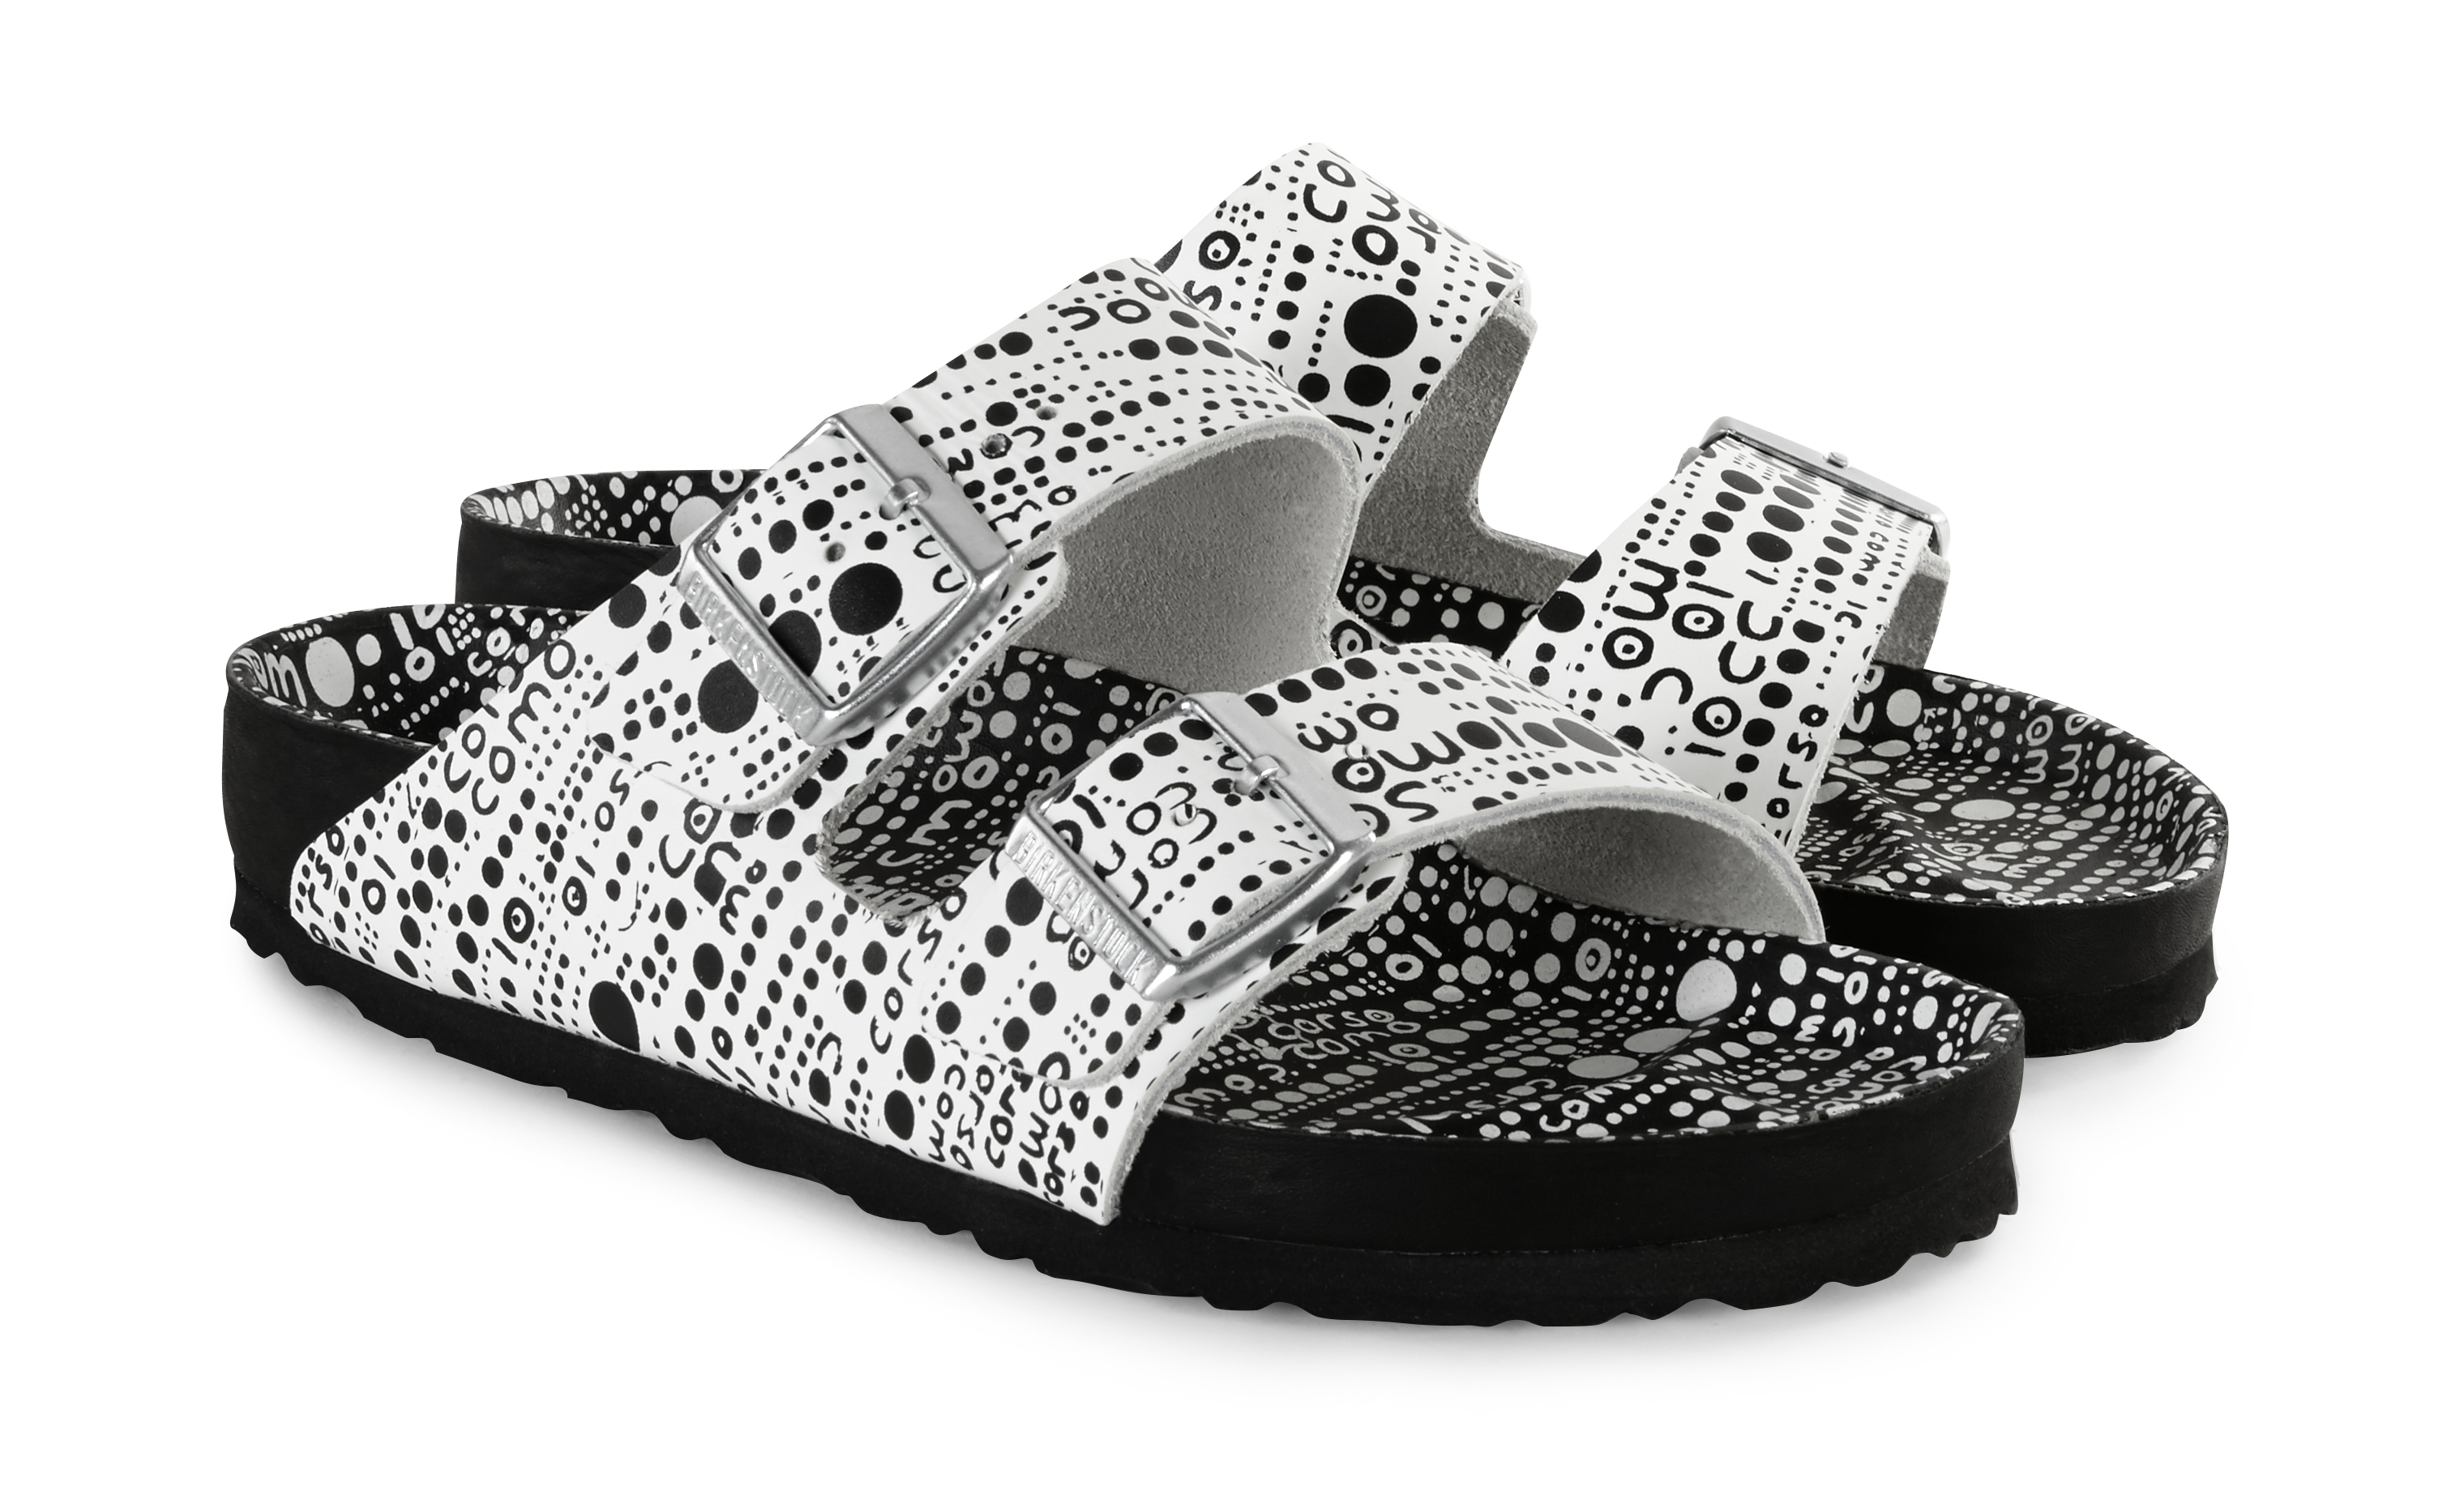 A pair of Birkenstock x 10 Corso Como sandals.